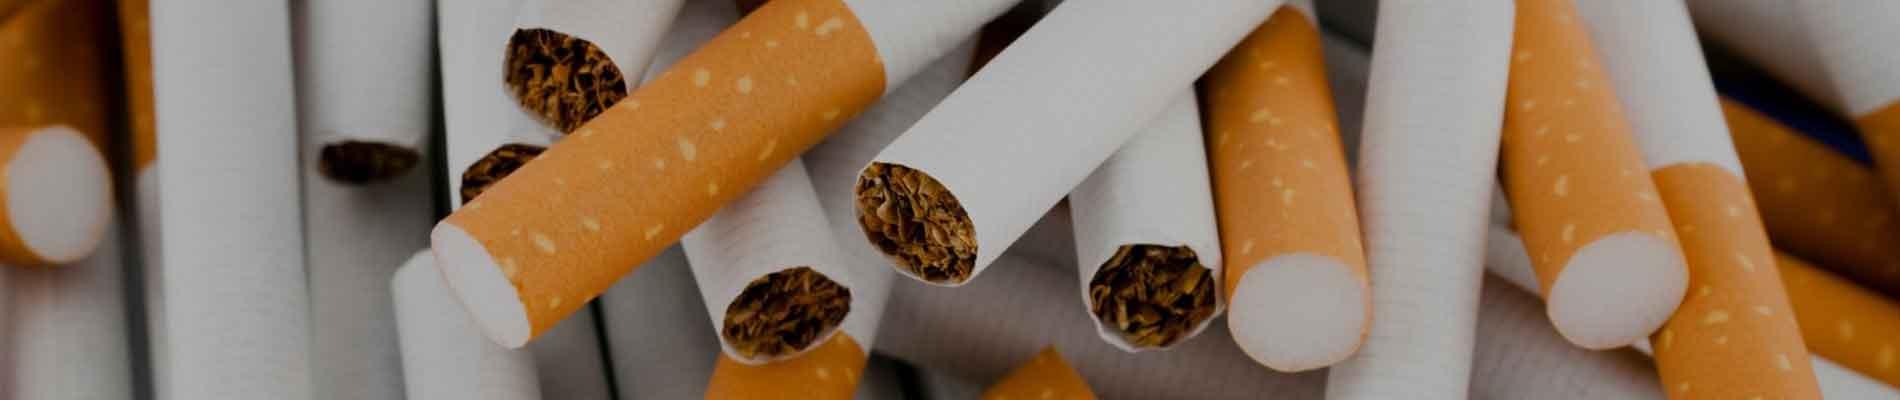 سیگار انبر نساء